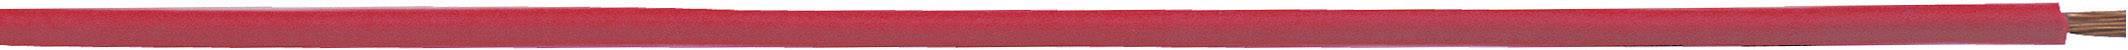 Opletenie / lanko LappKabel 4510021 H05V-K, 1 x 0.50 mm², vonkajší Ø 2.10 mm, 100 m, modrá